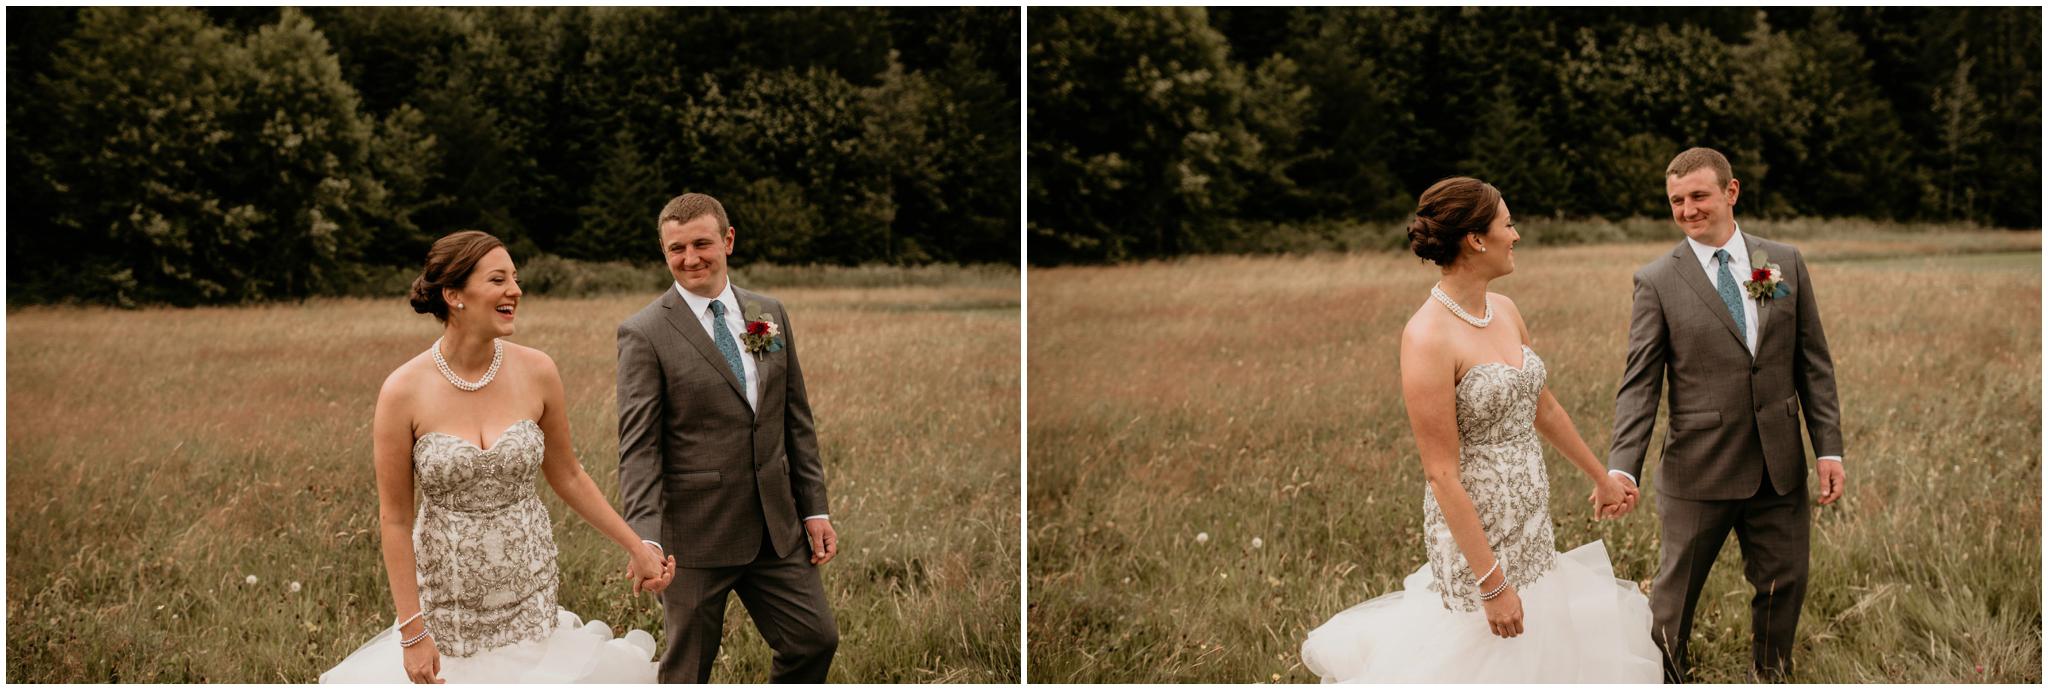 alex-and-matthew-three-cs-farm-venue-seattle-wedding-photographer-051.jpg